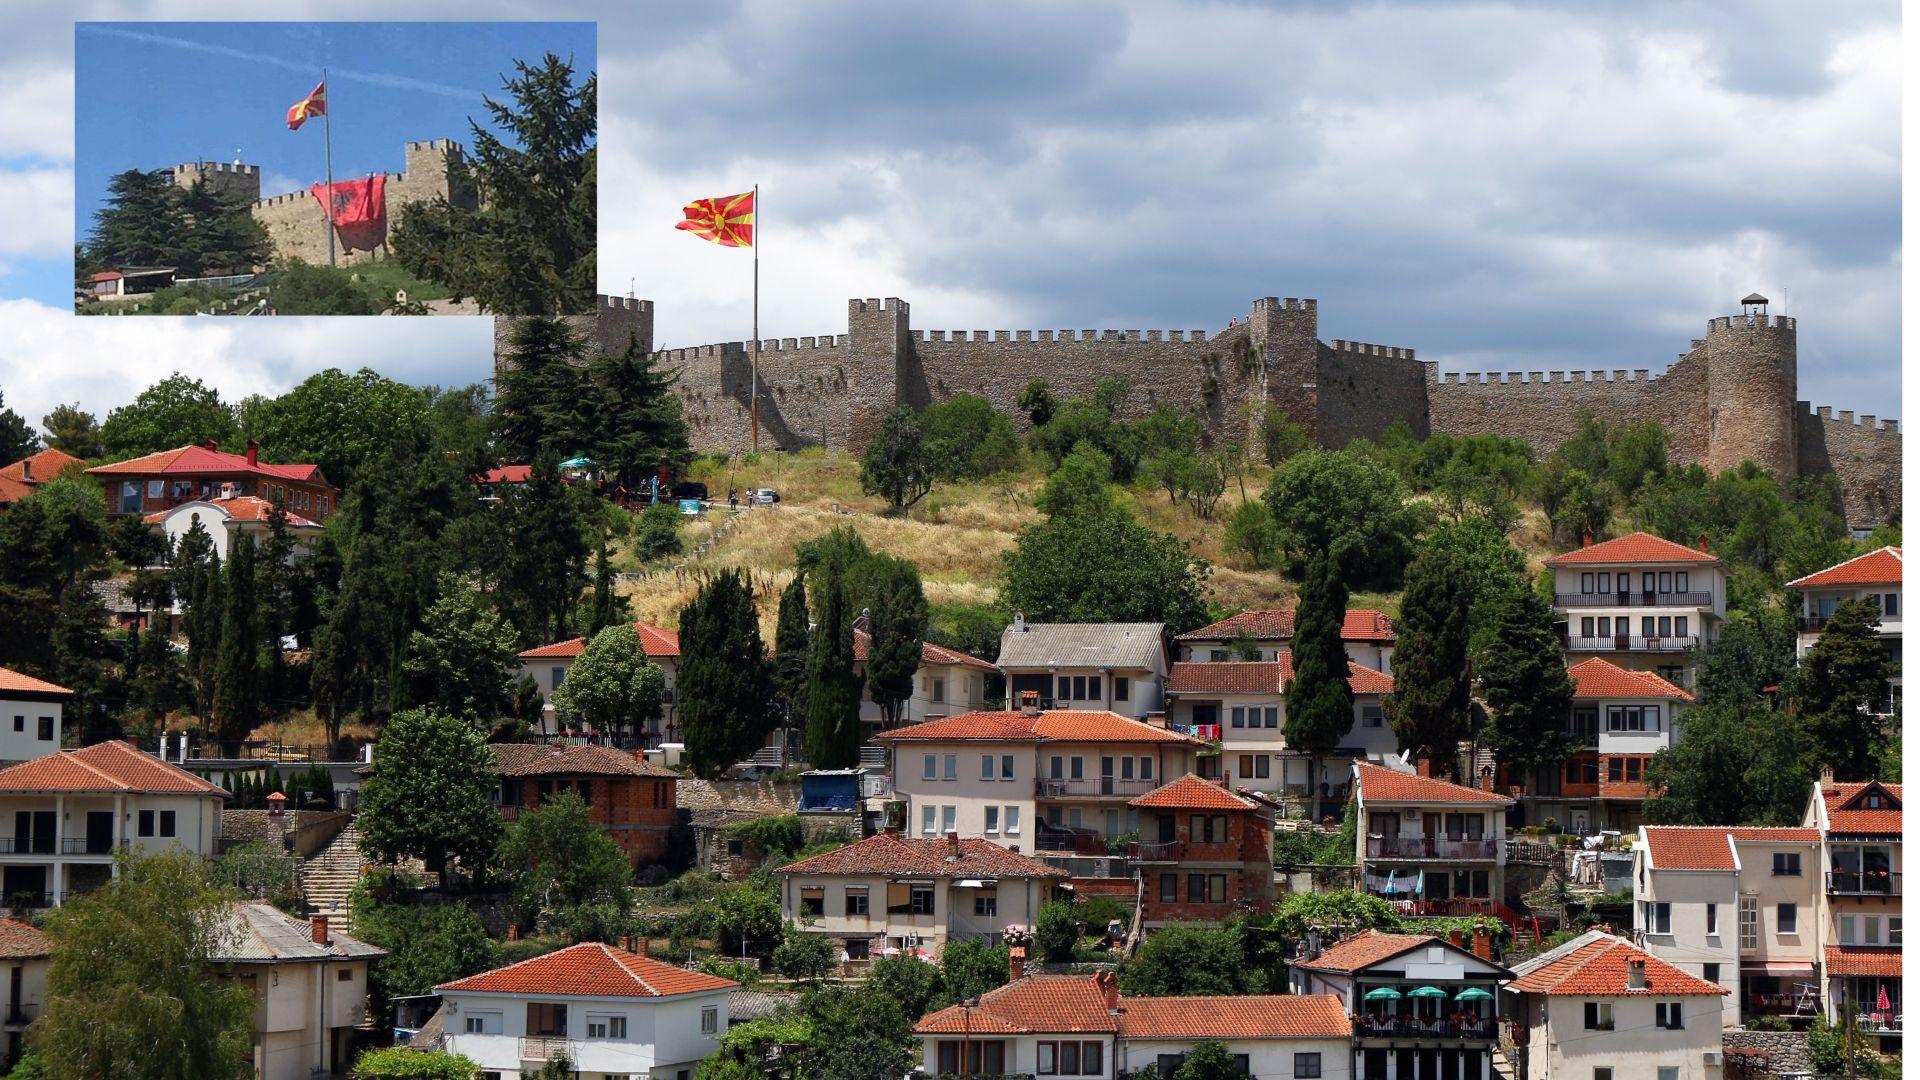 Огромно албанско знаме над Самуиловата крепост скандализира Охрид